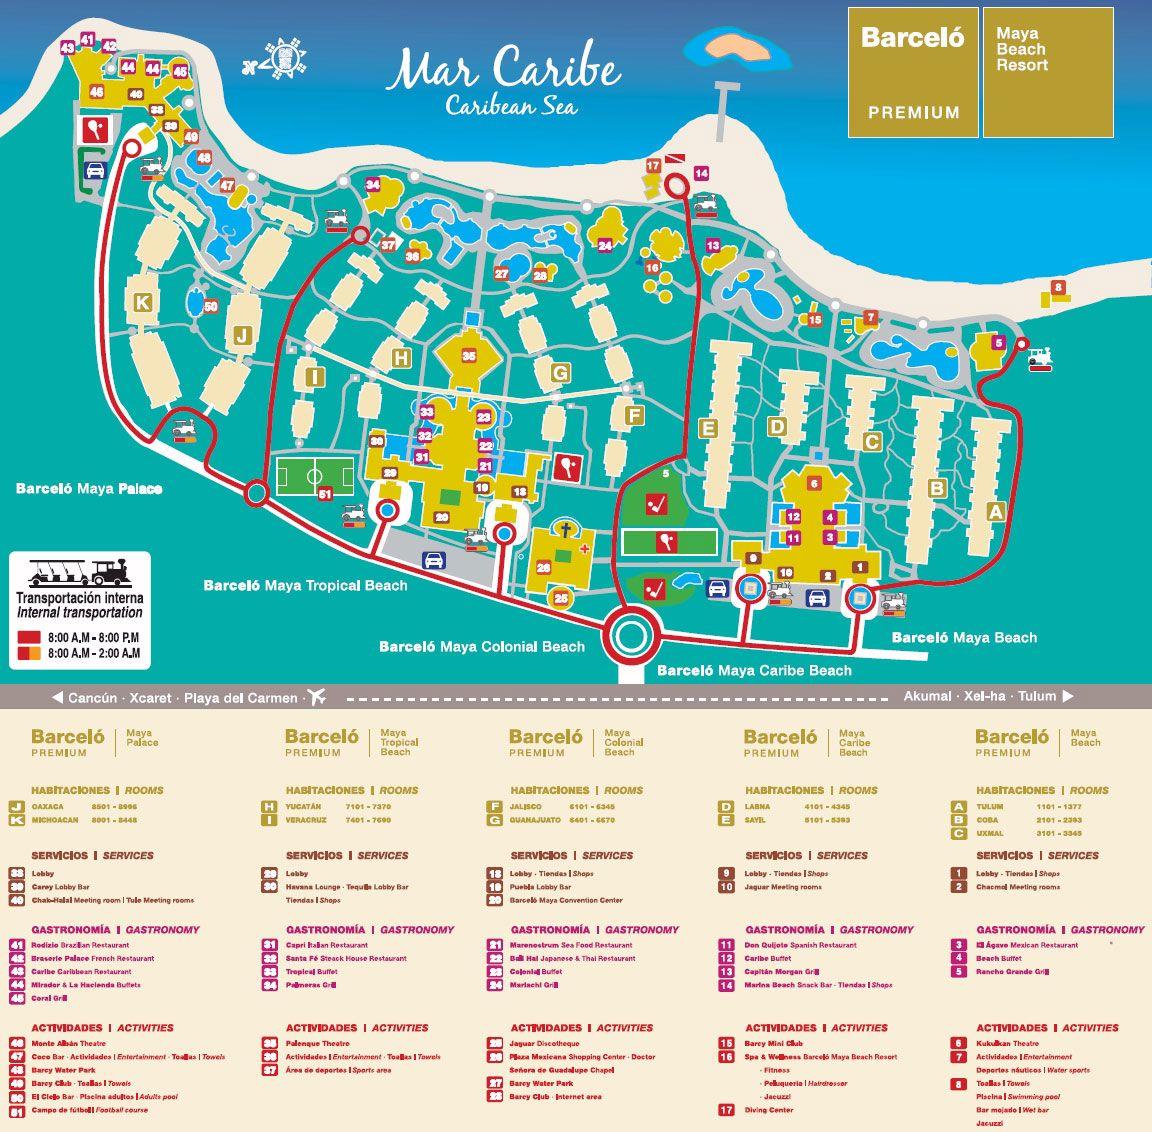 Barcelo-maya-palace-map.jpg Mexico, Puerto Aventuras